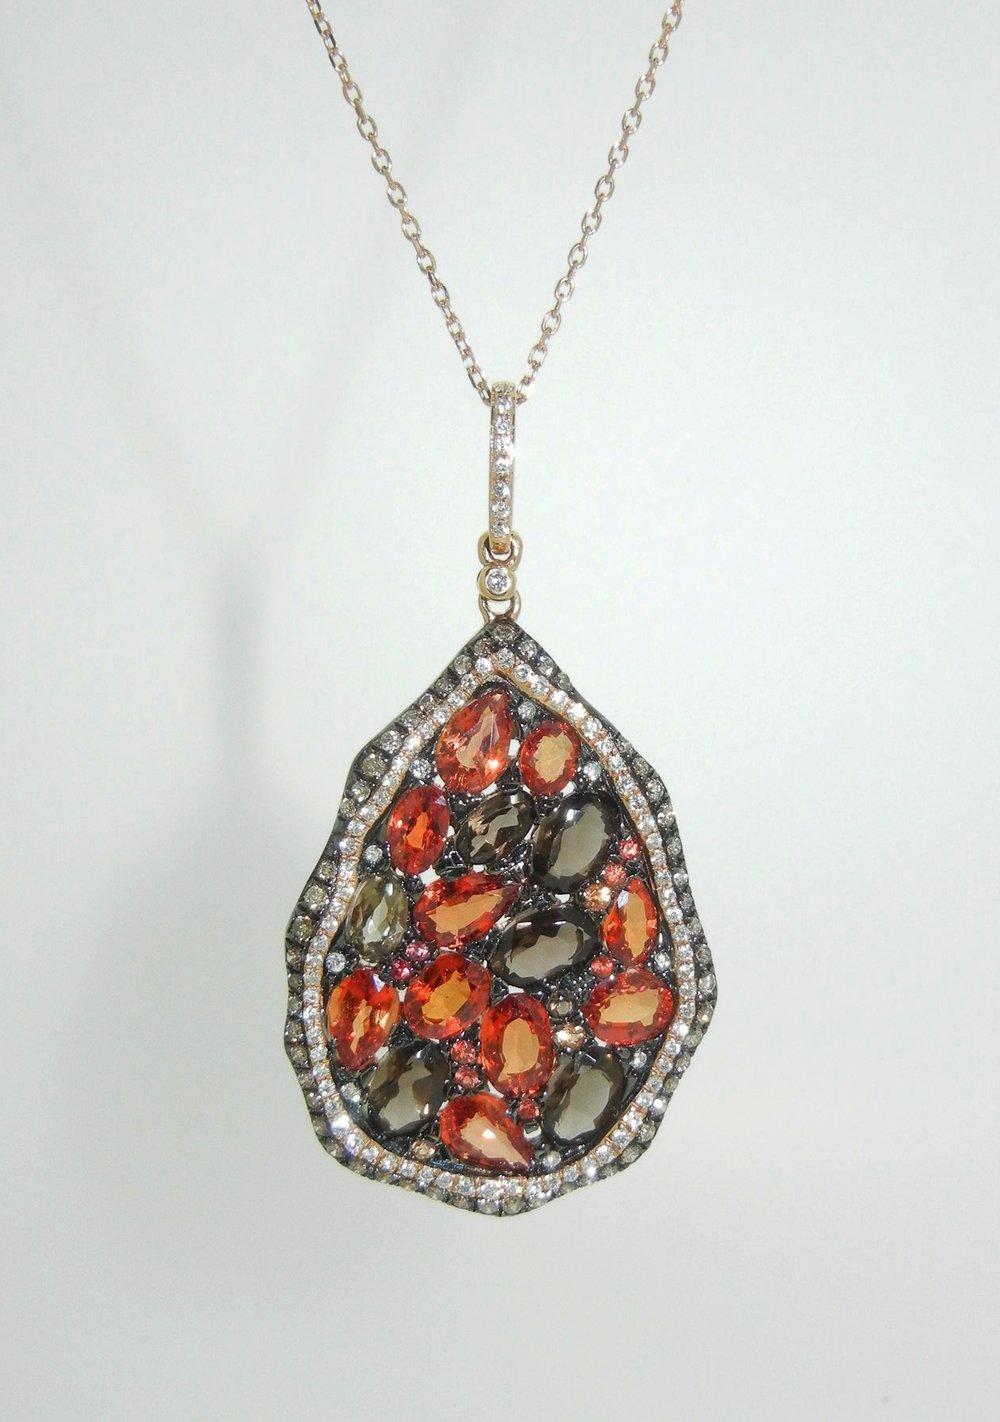 Sapphire, Diamond, and Quartz Pendant set in 18K Rose Gold $3,350